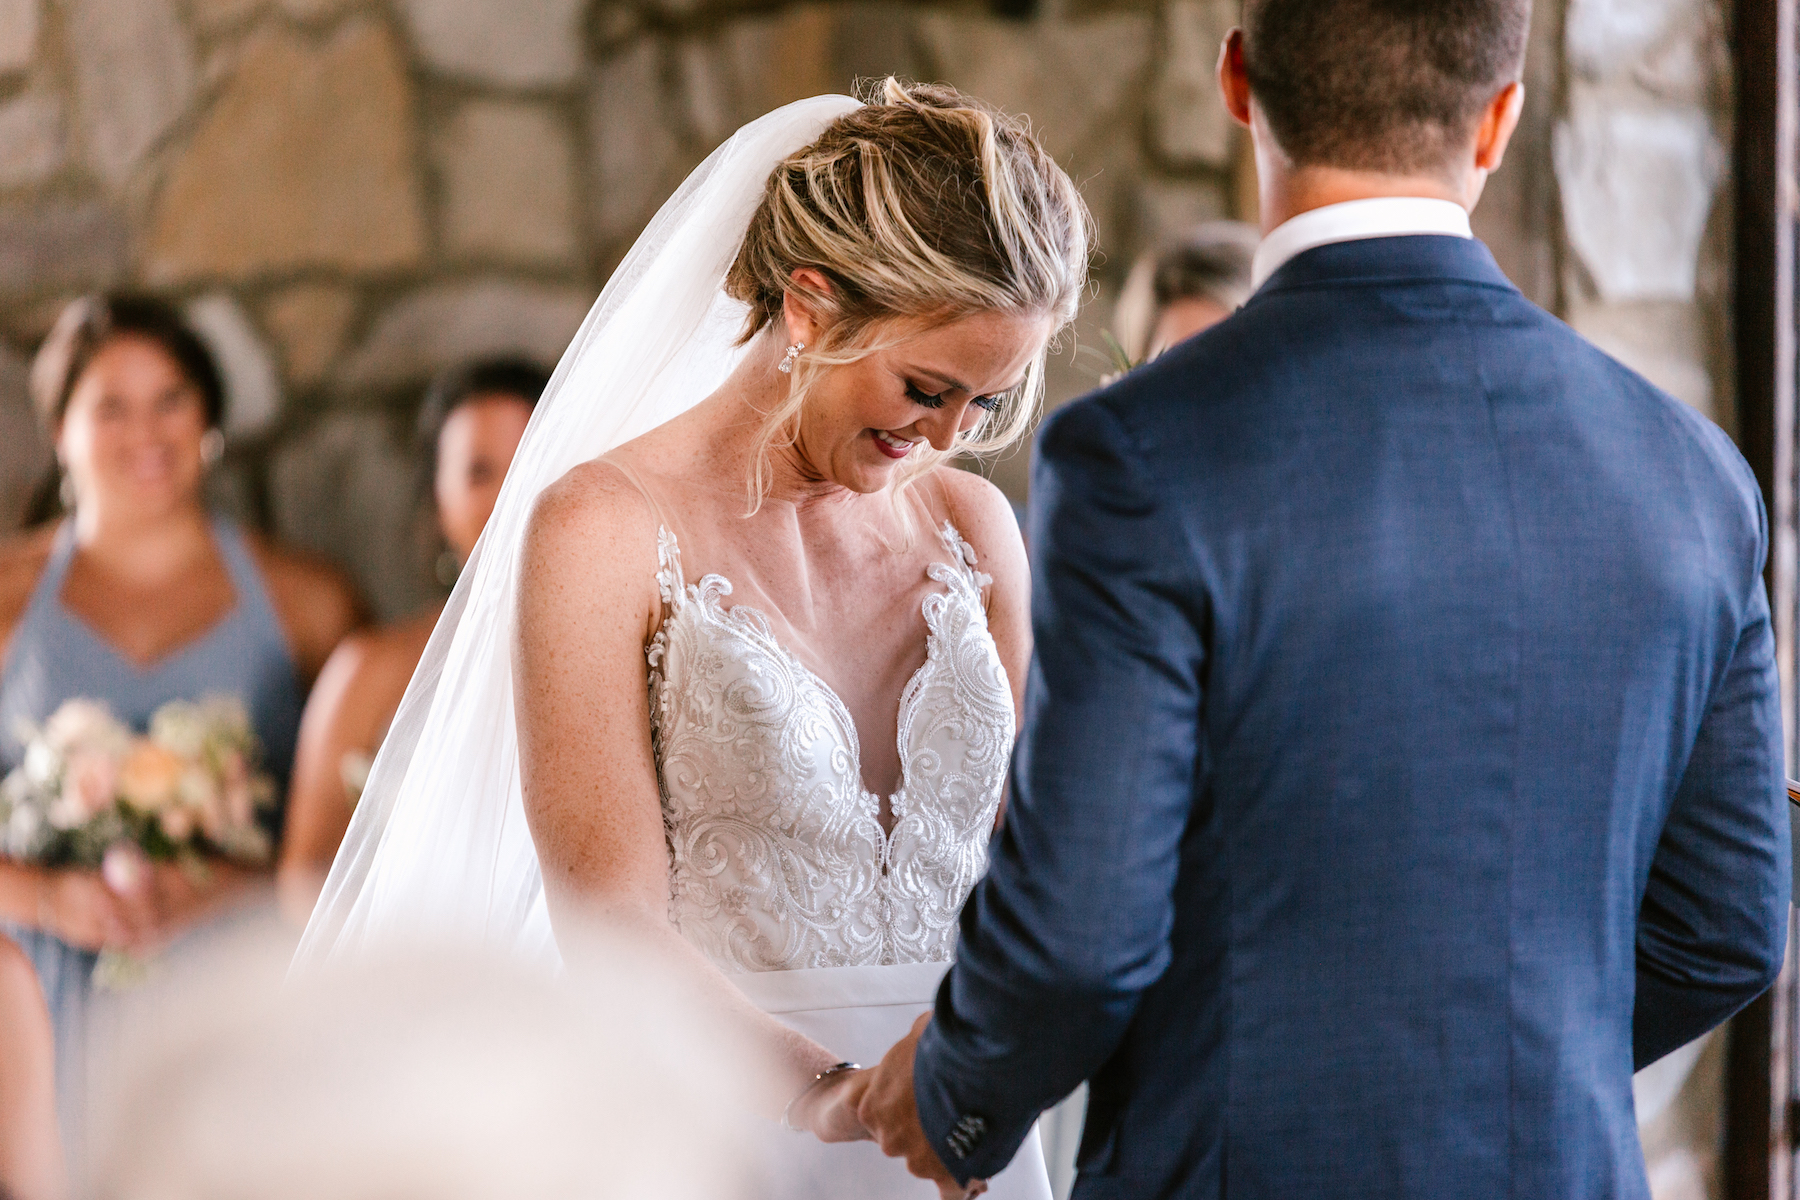 wedding-engagement-photographer-spartanburg-greenville-columbia-carolina-south-north-489.JPG